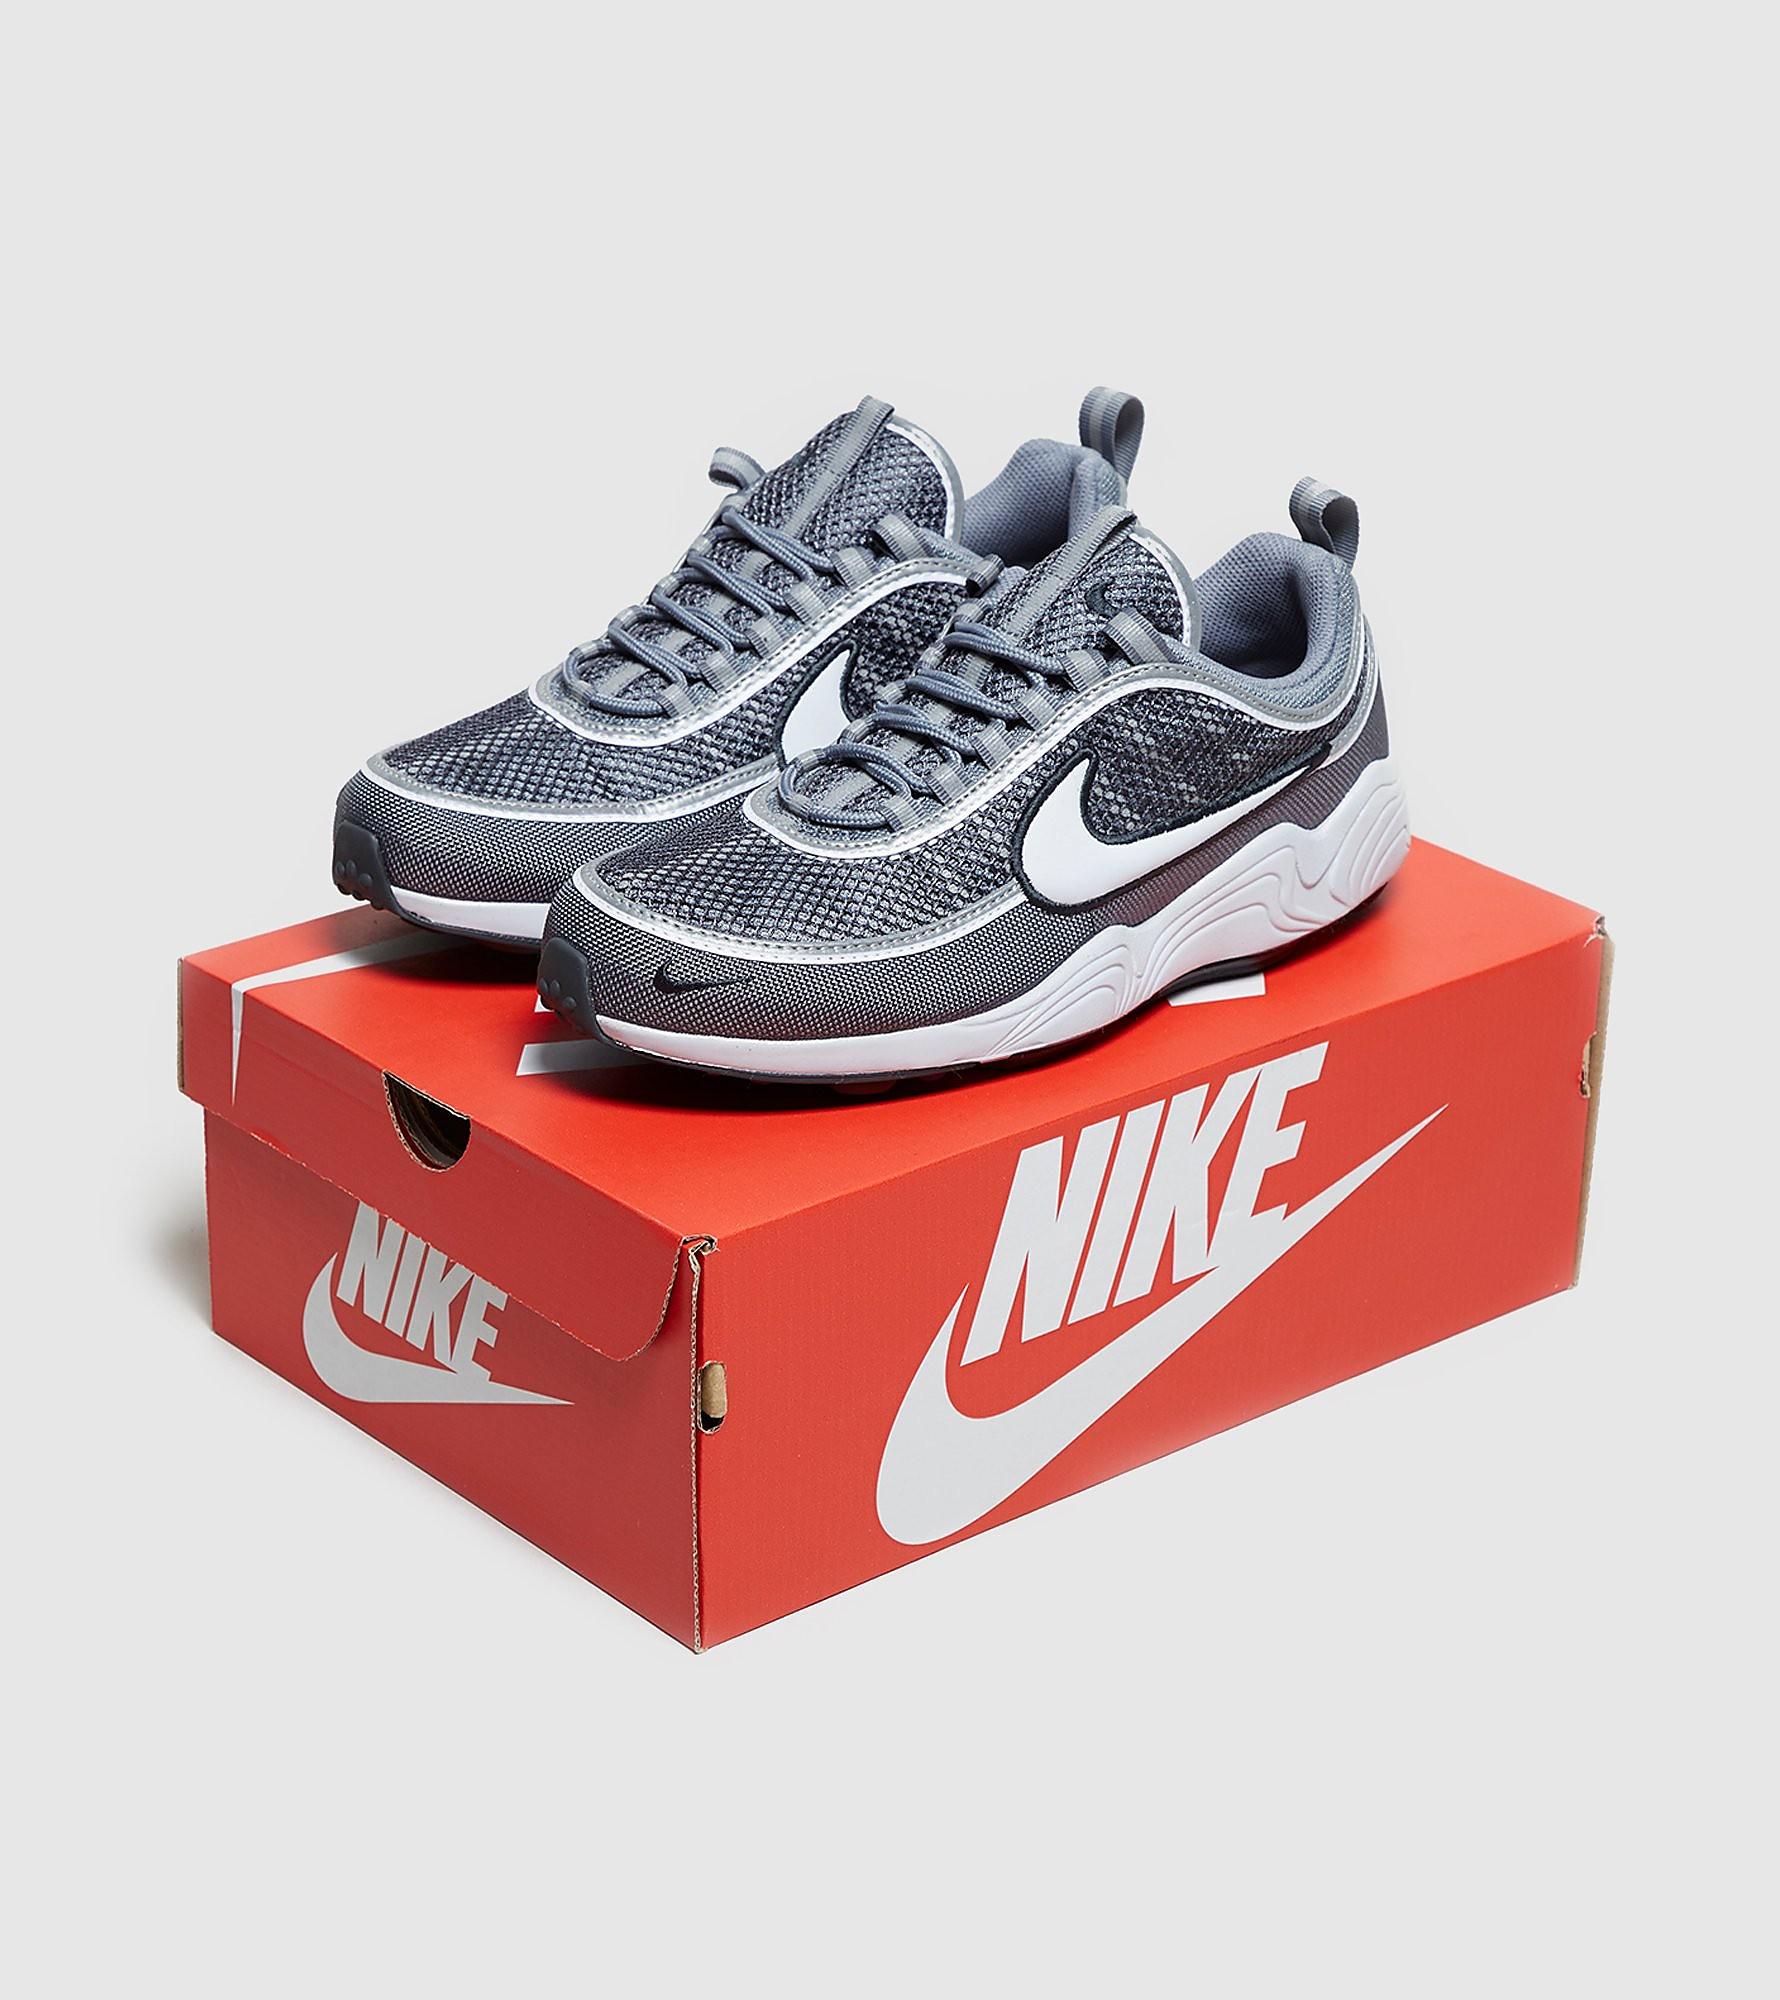 Nike Spiridon OG